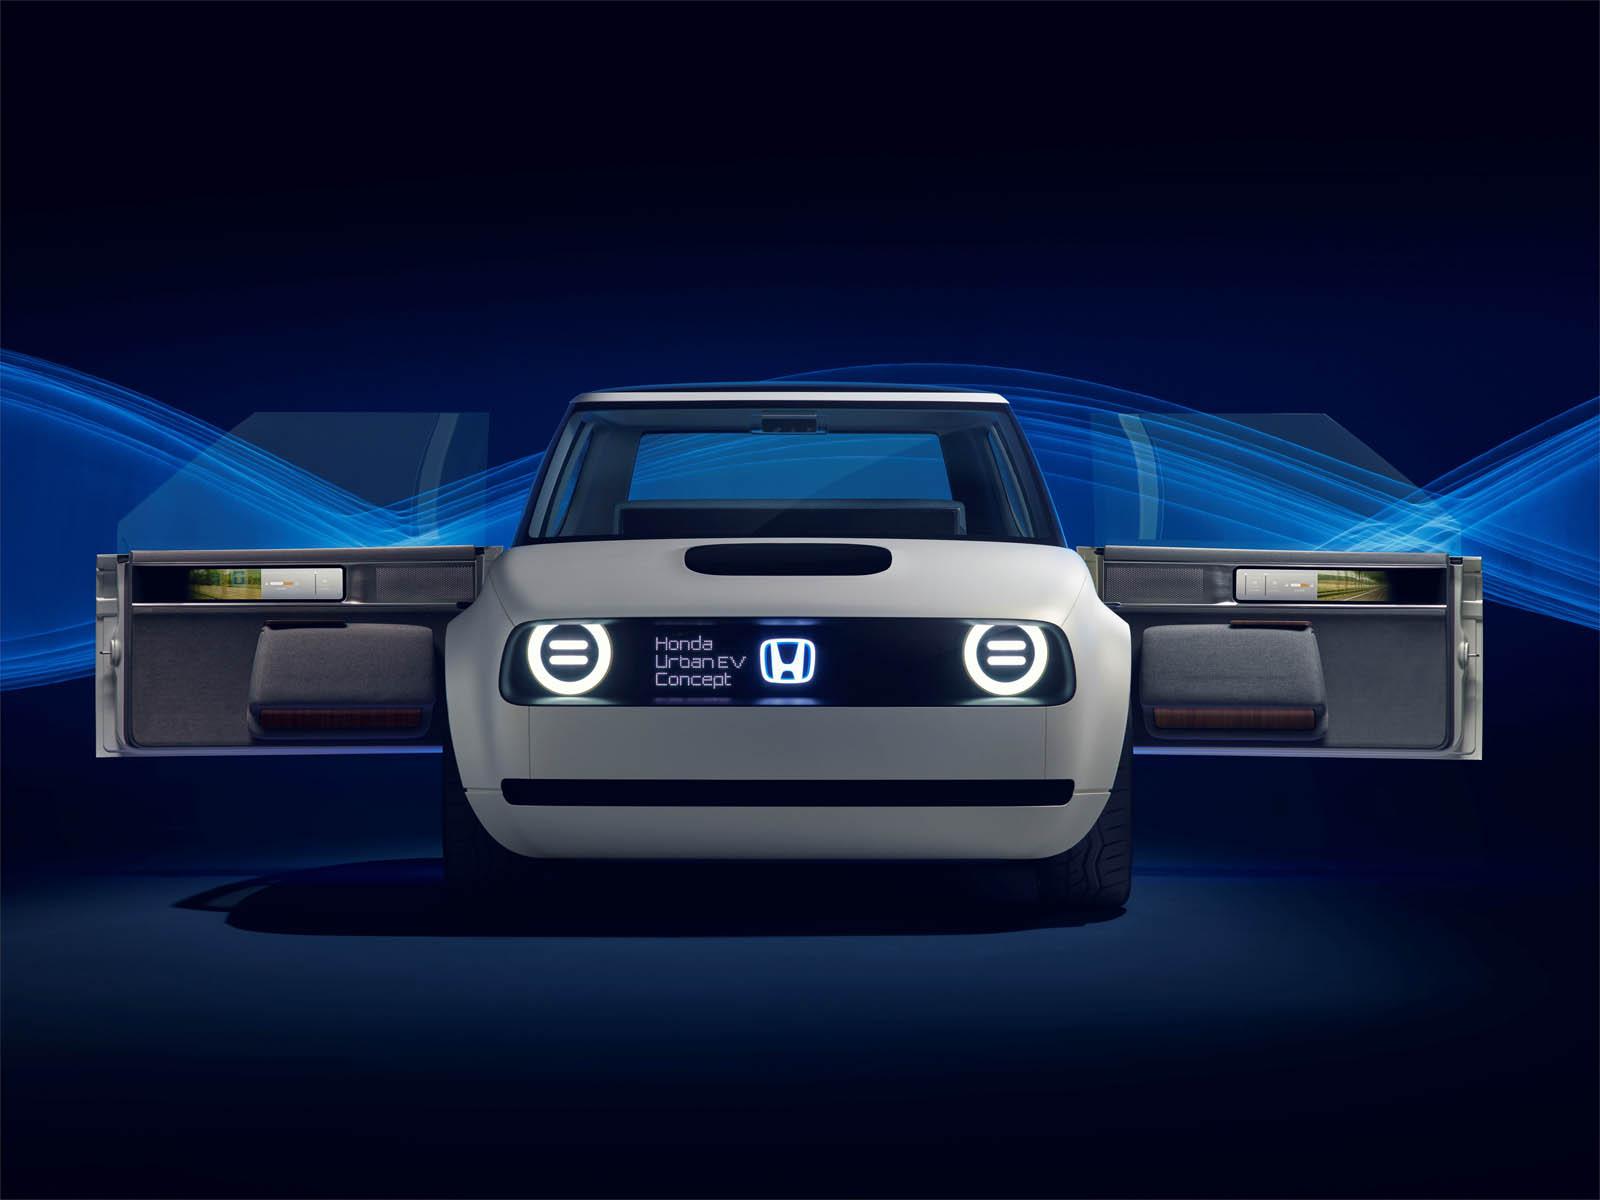 113867_Honda_Urban_EV_Concept_unveiled_at_the_Frankfurt_Motor_Show copy.jpg